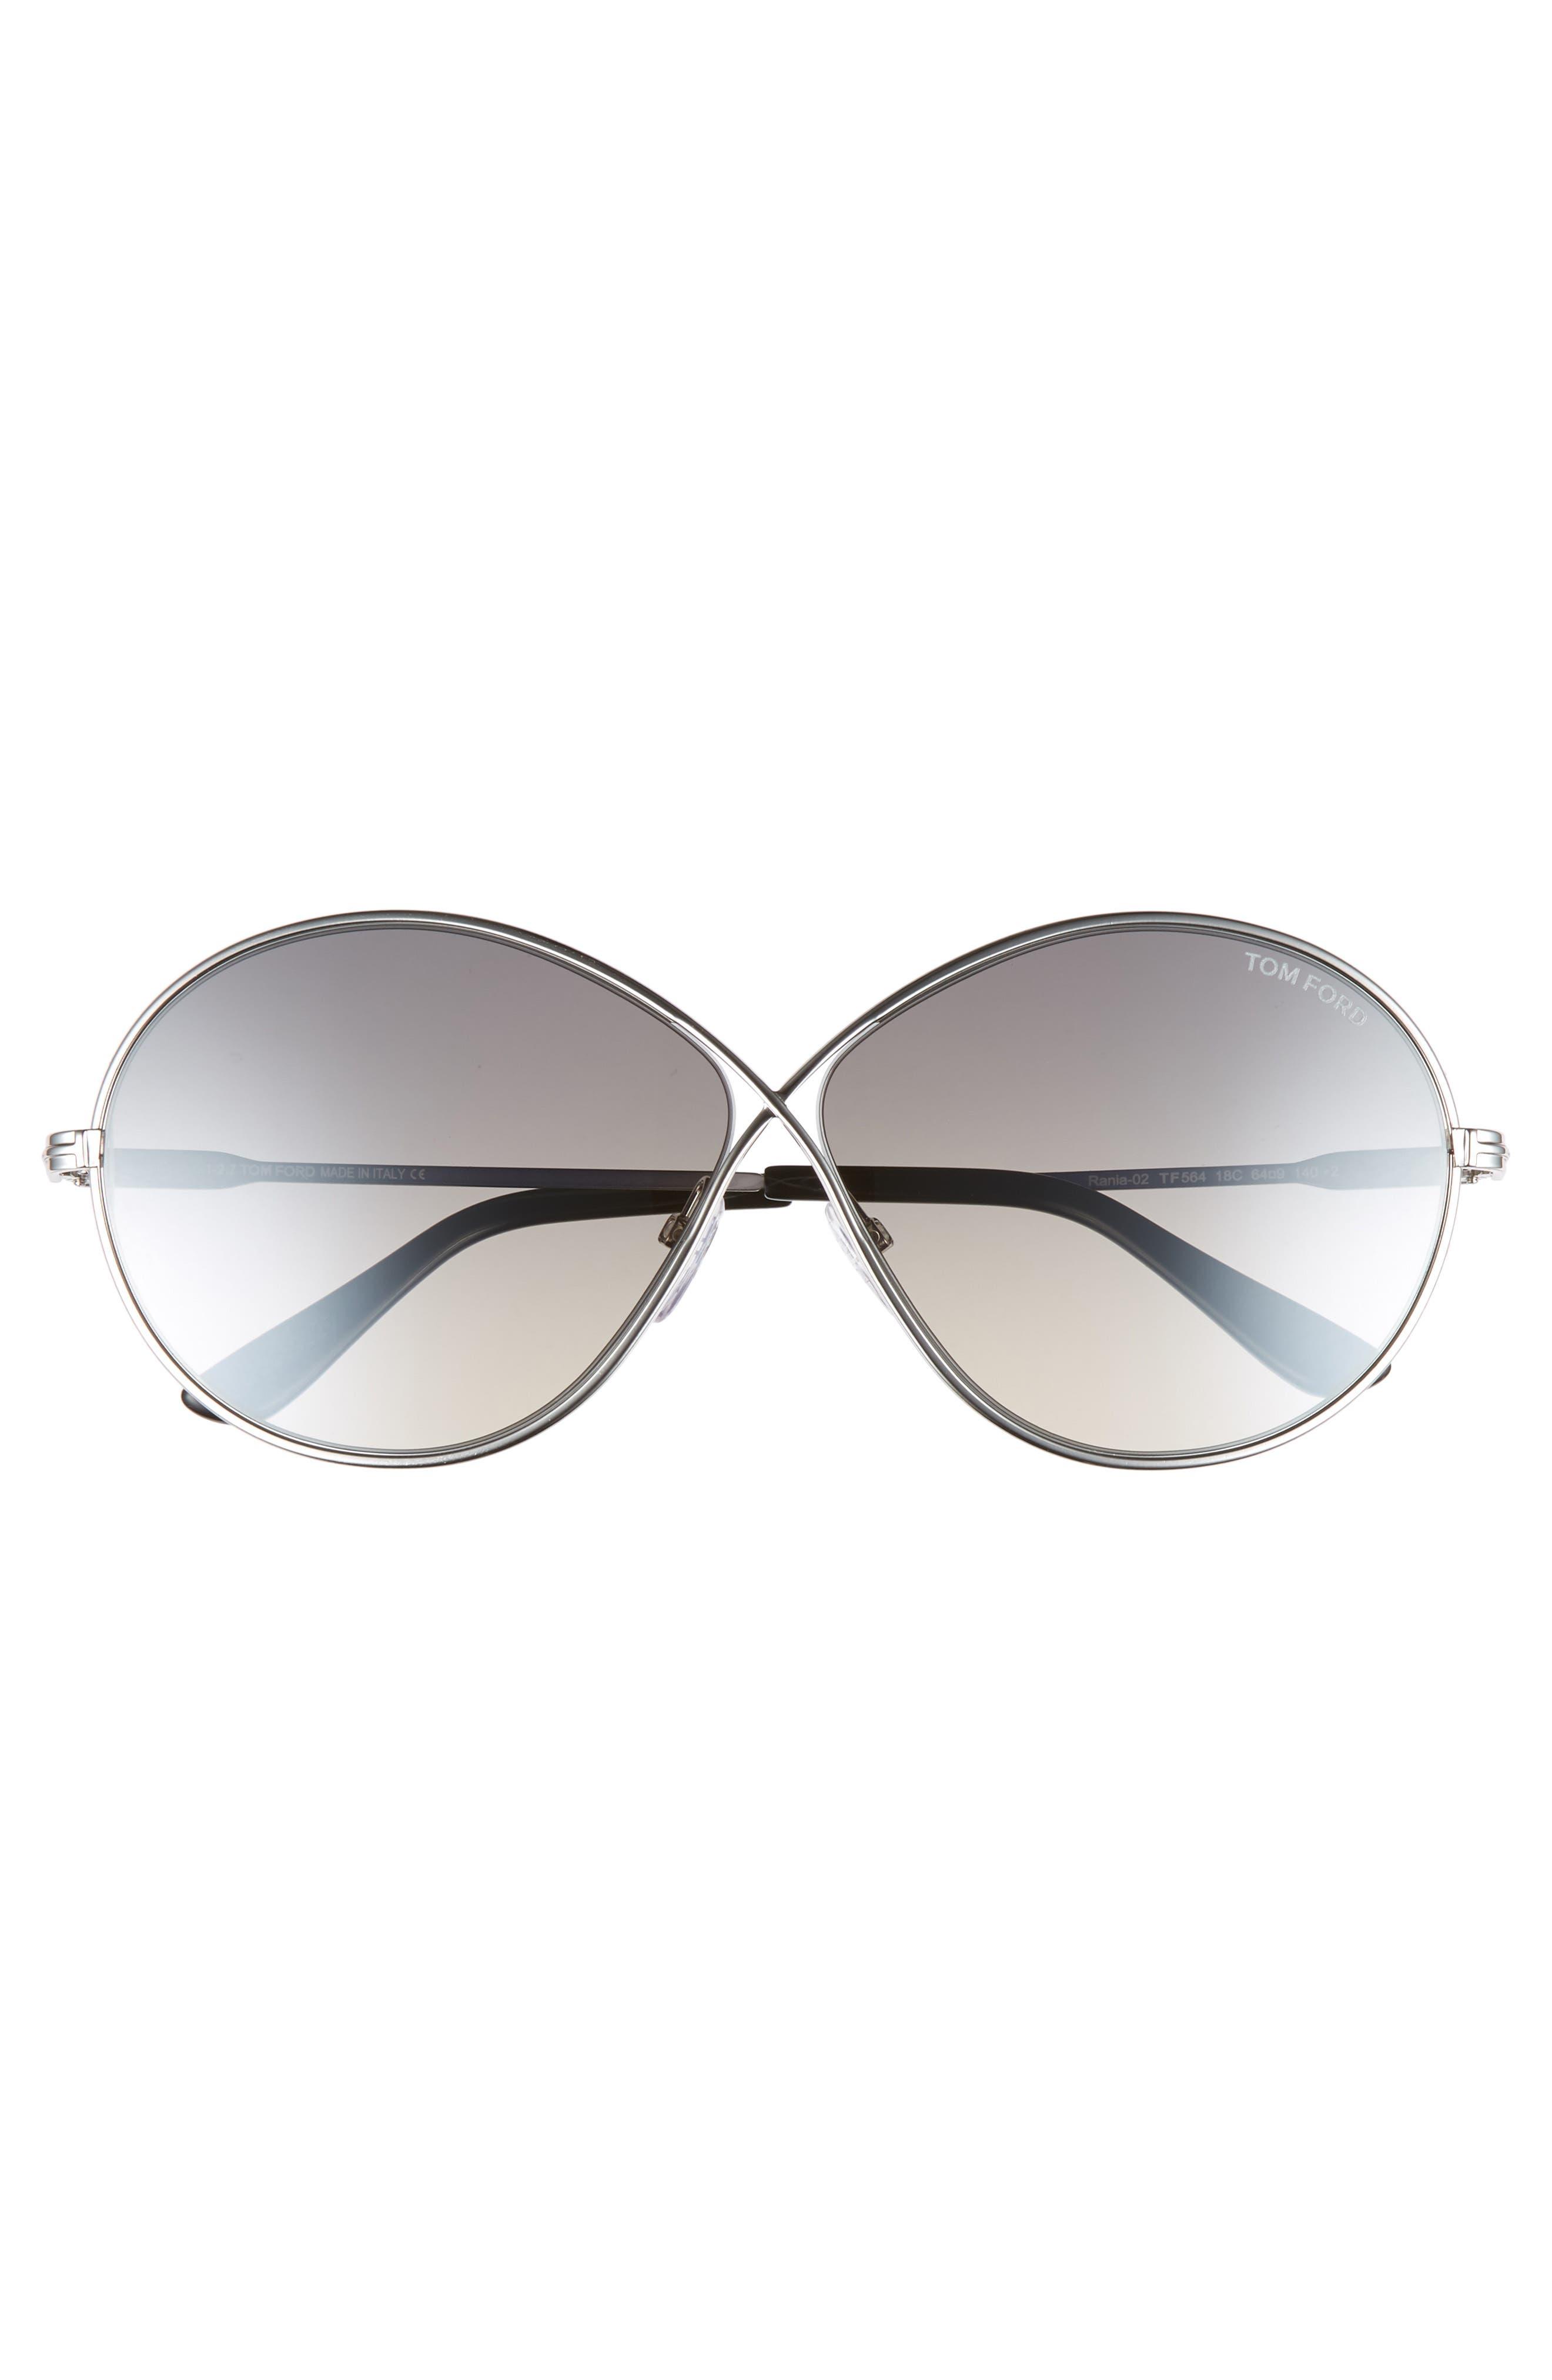 Rania 64mm Oversize Round Sunglasses,                             Alternate thumbnail 3, color,                             040